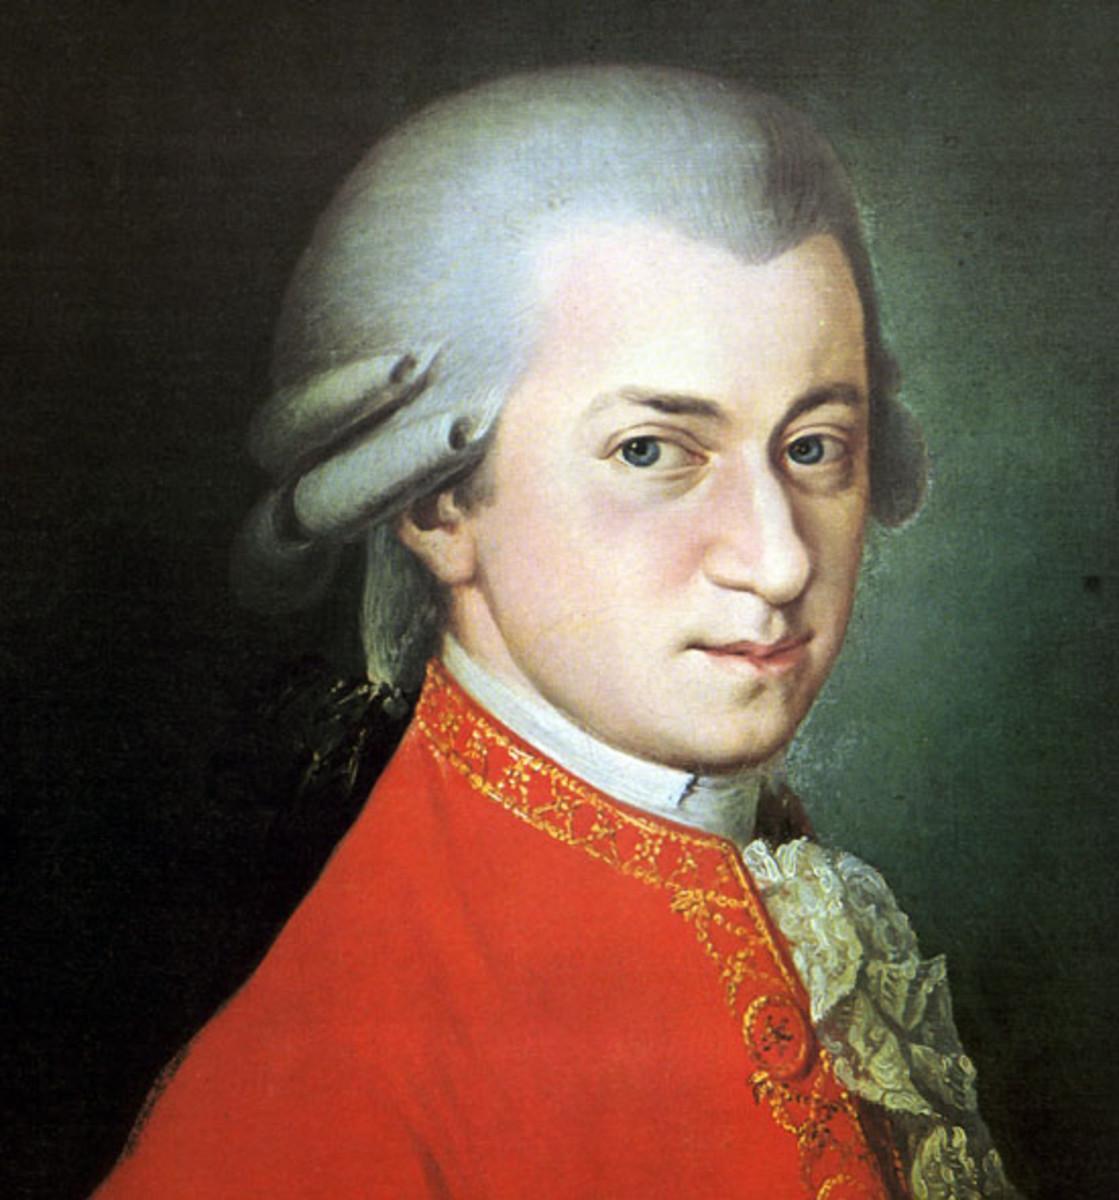 Mozart, posthumous portrait by Barbara Krafft, 1819.